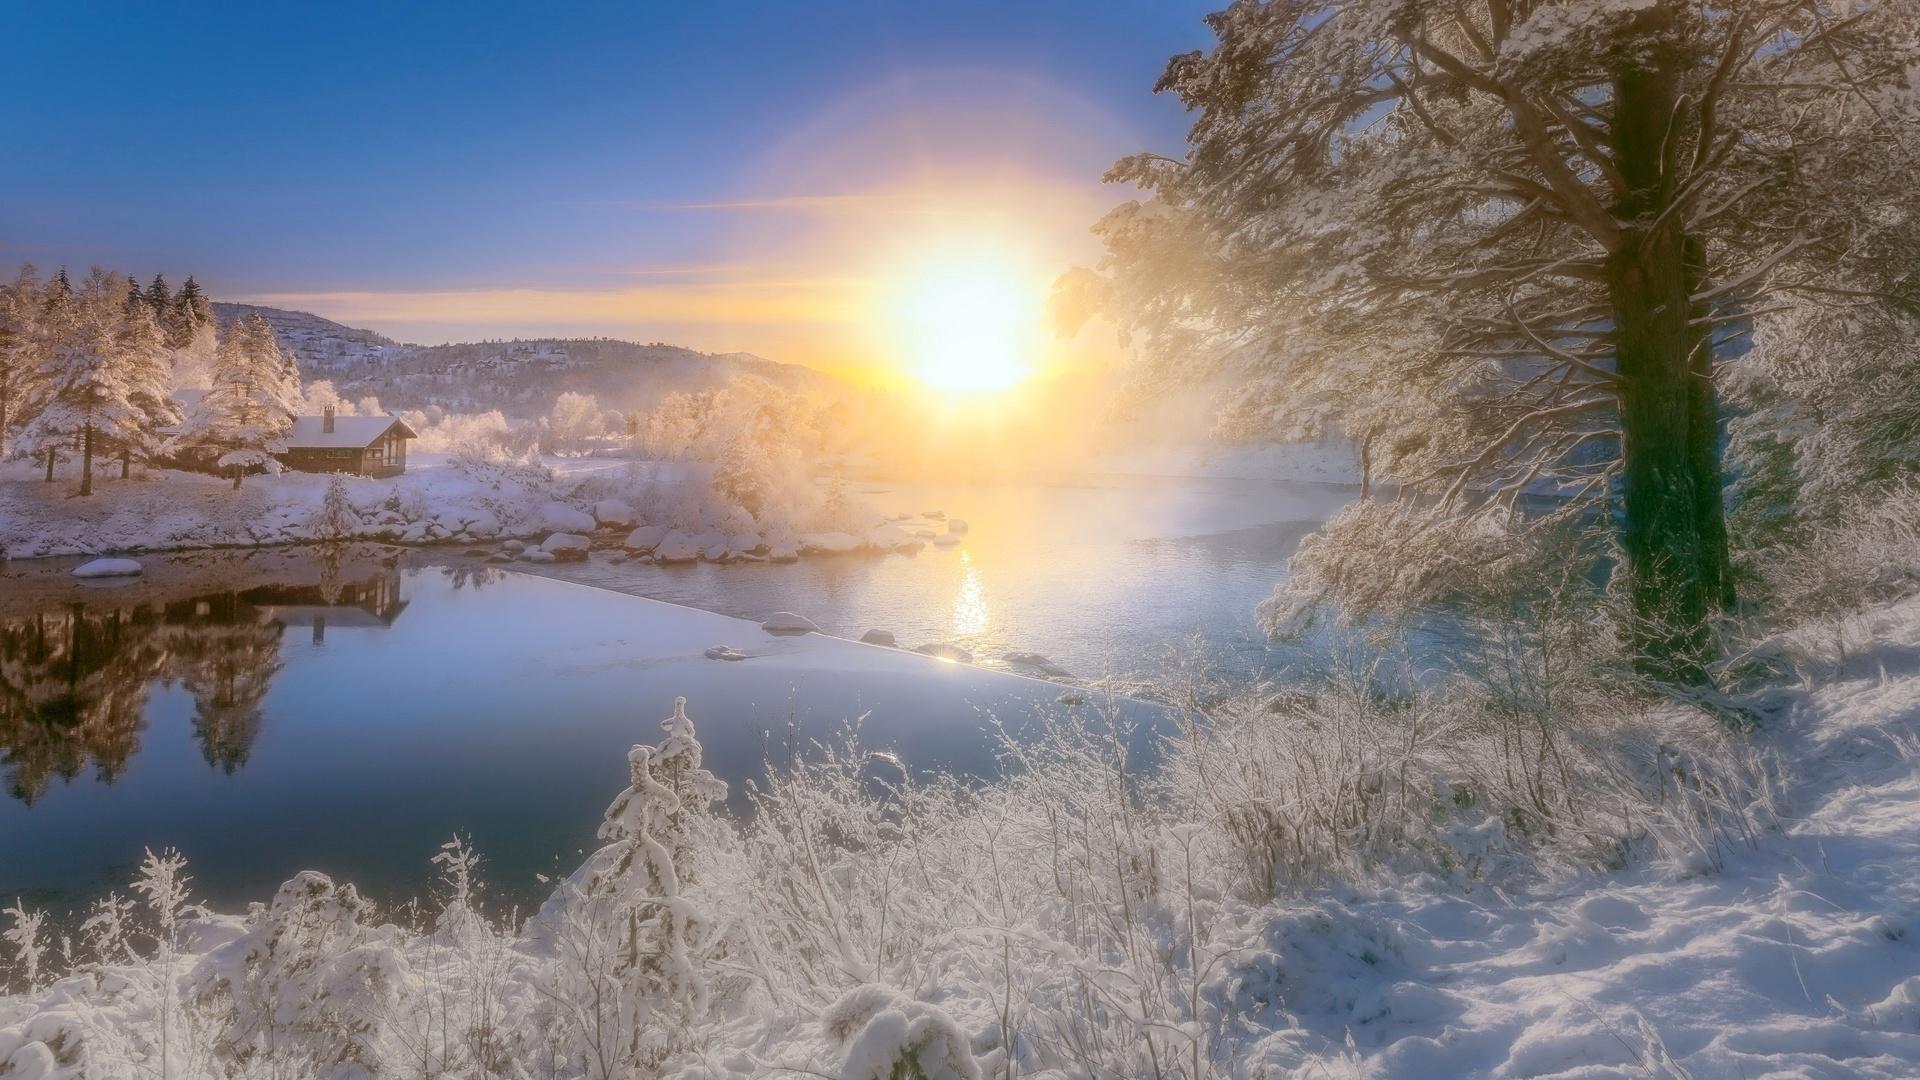 Snowy Morning Image